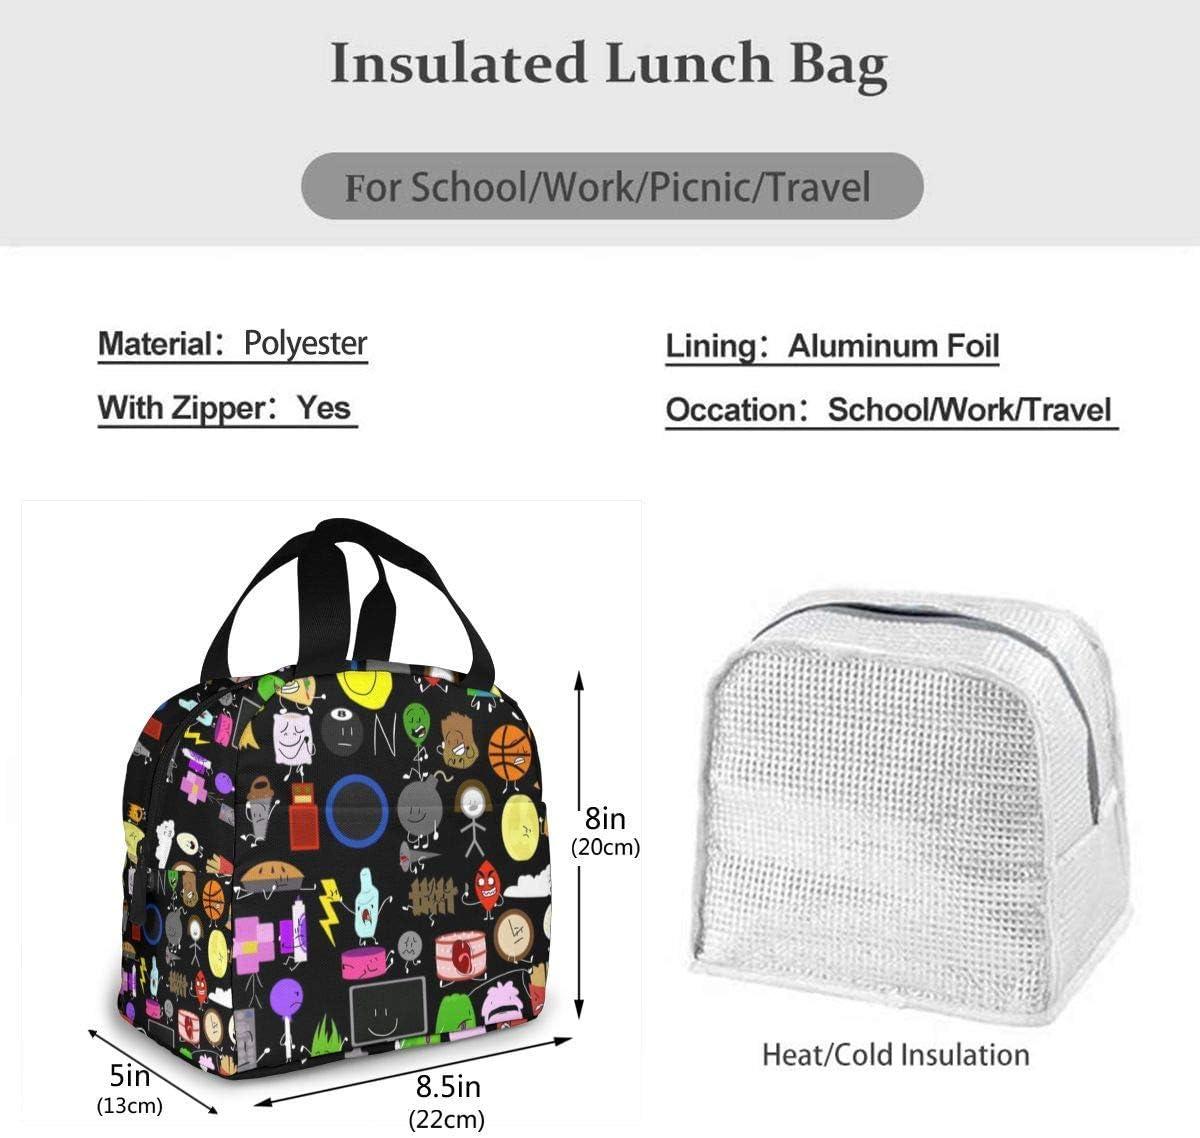 Hdadwy Kampf um Bfdi Schule Handtasche Lunchbox Kulturbeutel f/ür Frauen M/änner Teenager Kinder